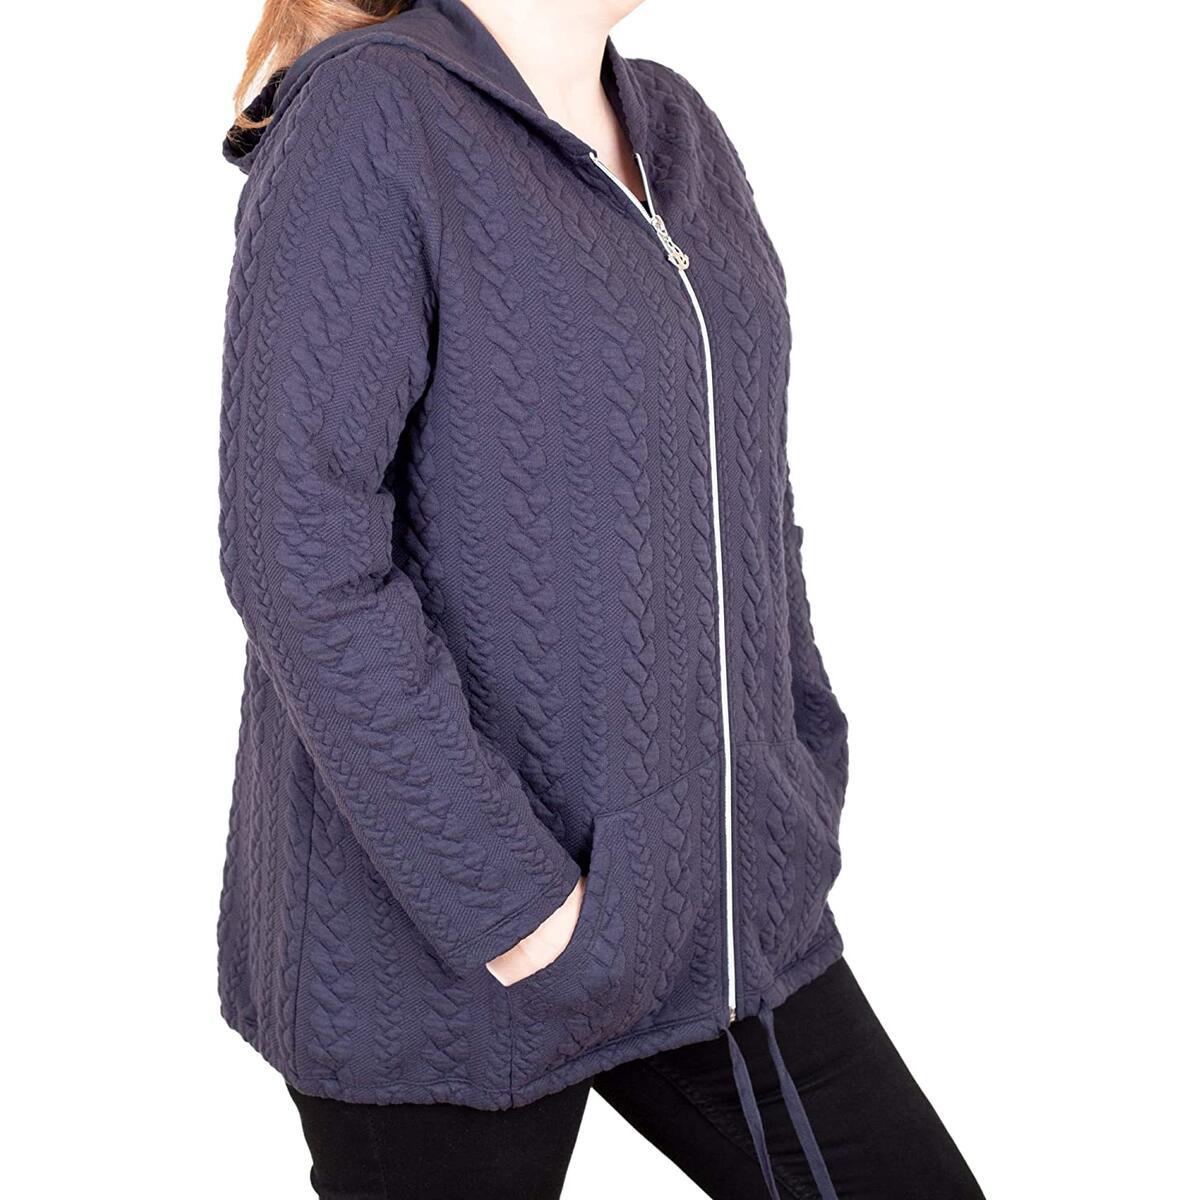 Reha Plus Size Jackets For Women - Oversized Hoodies For Women, 76% Polyester 20% Cotton 4% EA Jackets For Women